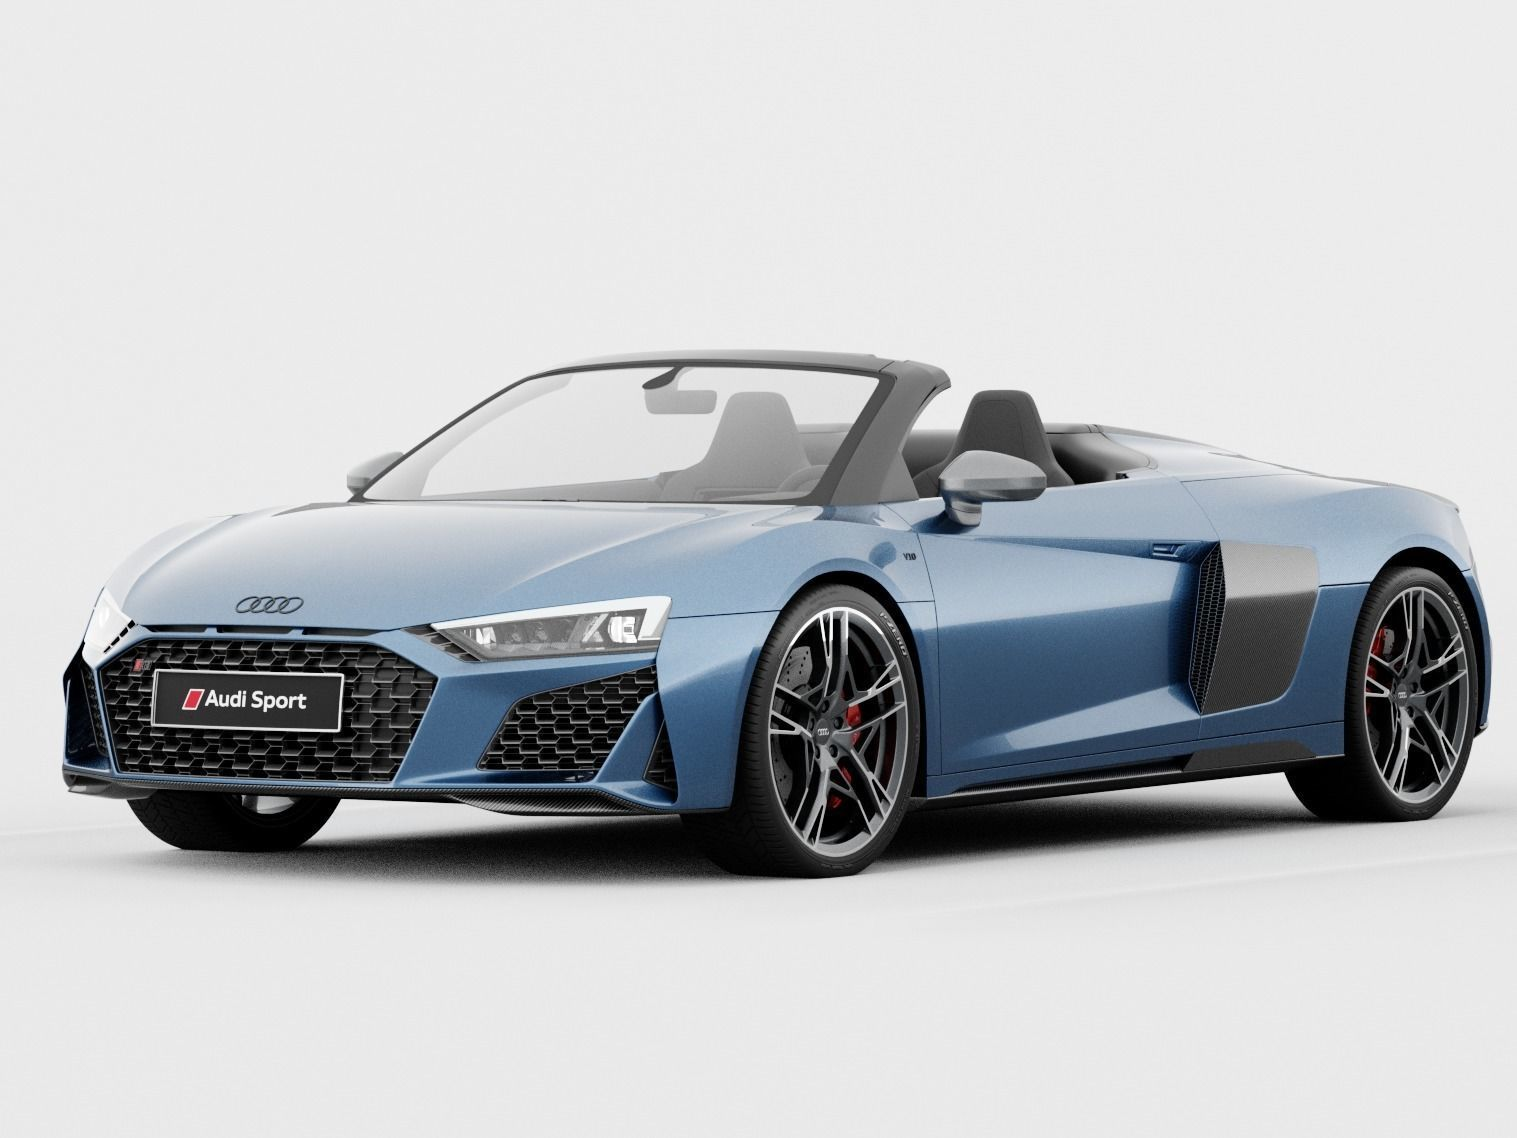 Audi R8 Spyder 2020 DETAILED INTERIOR